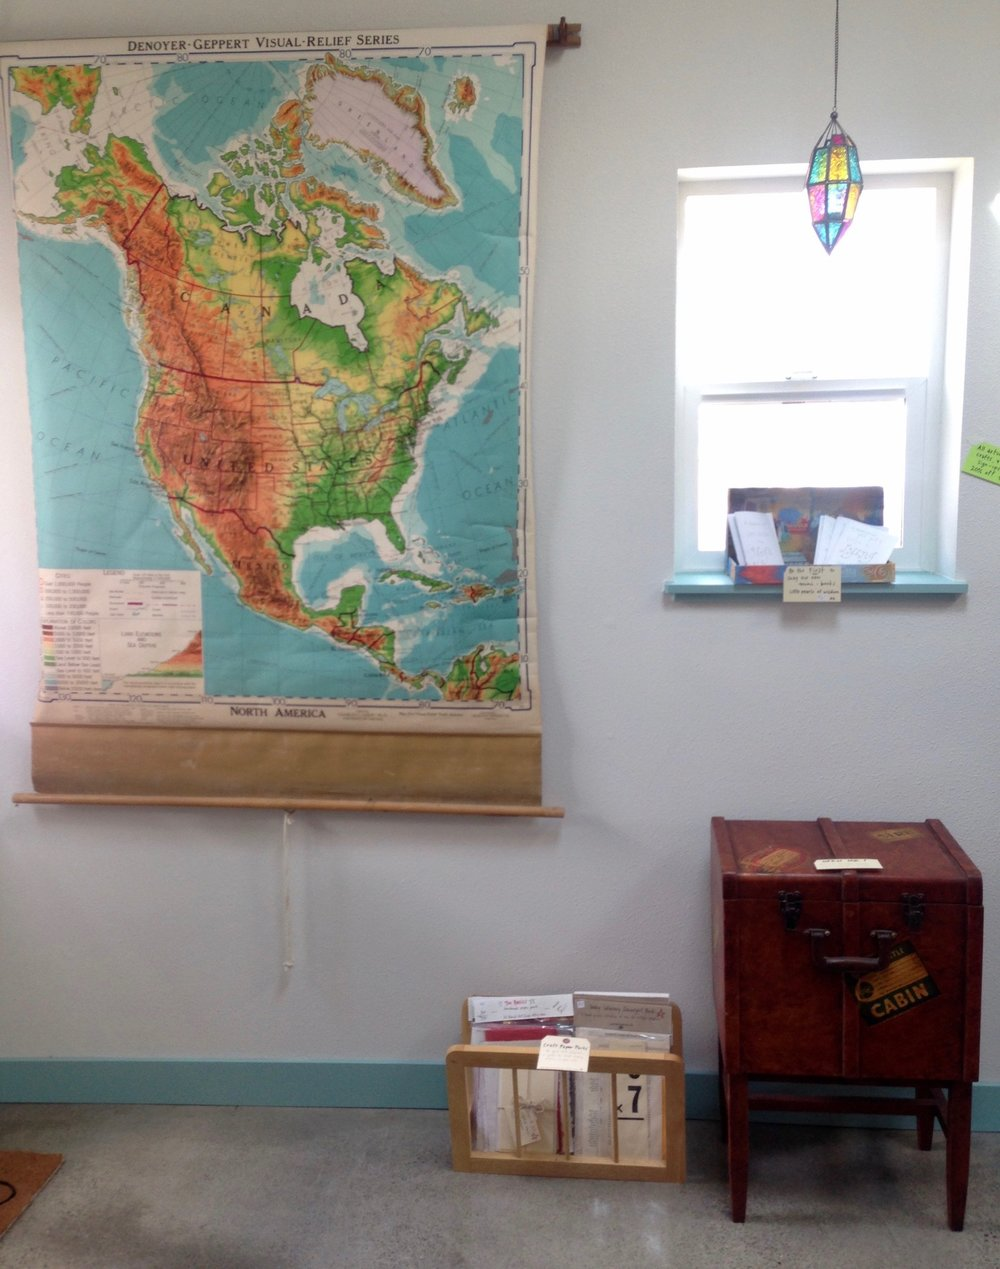 school map and window.jpg